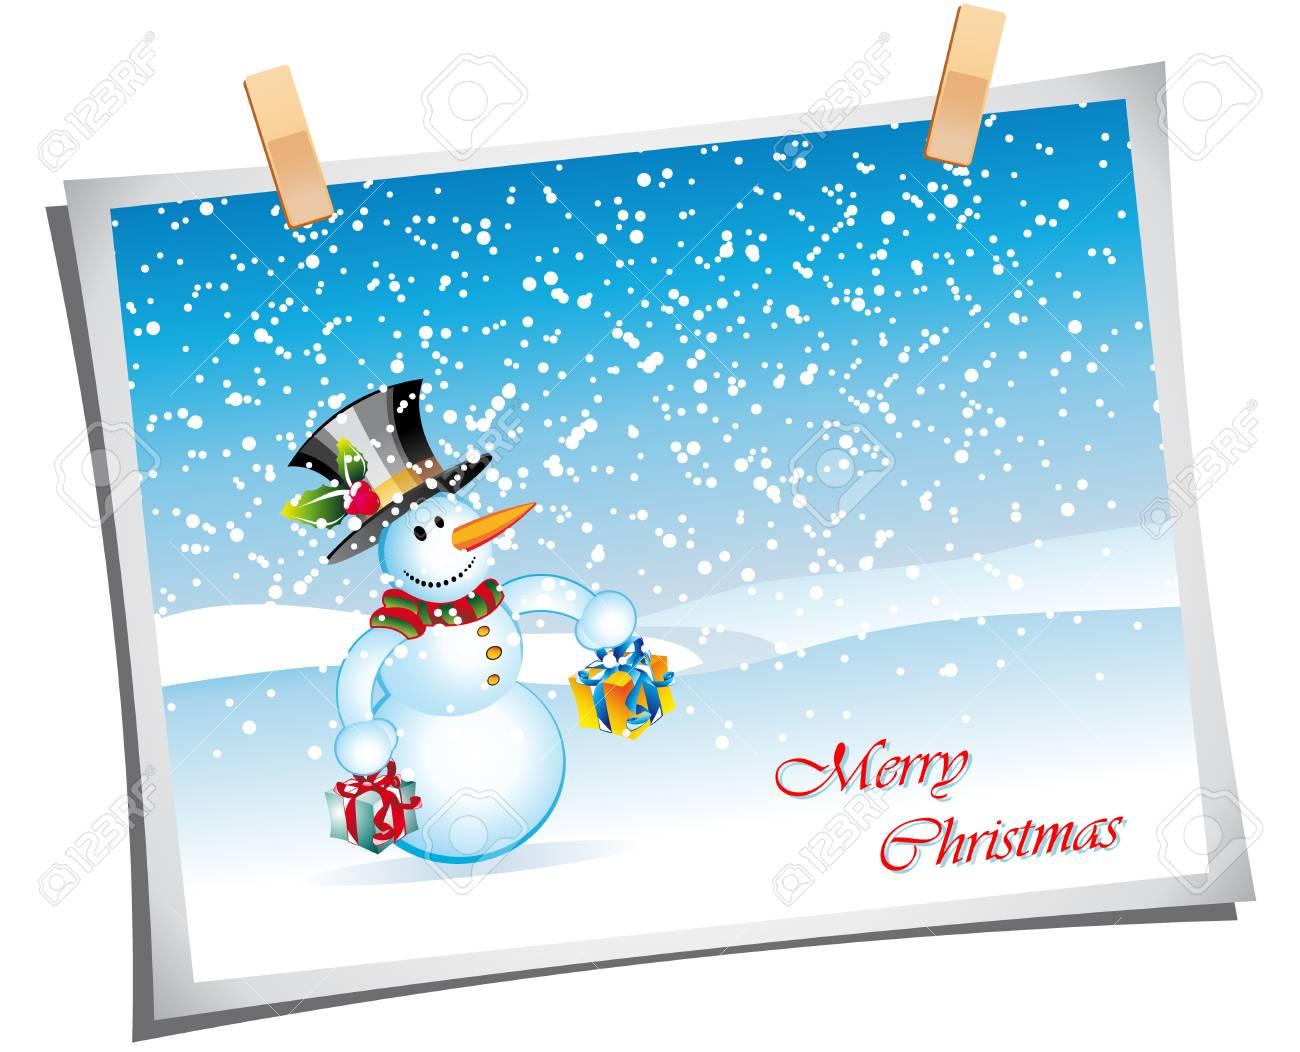 Merry Christmas Greetings card with cartoon snowman Stock Vector - 6125625